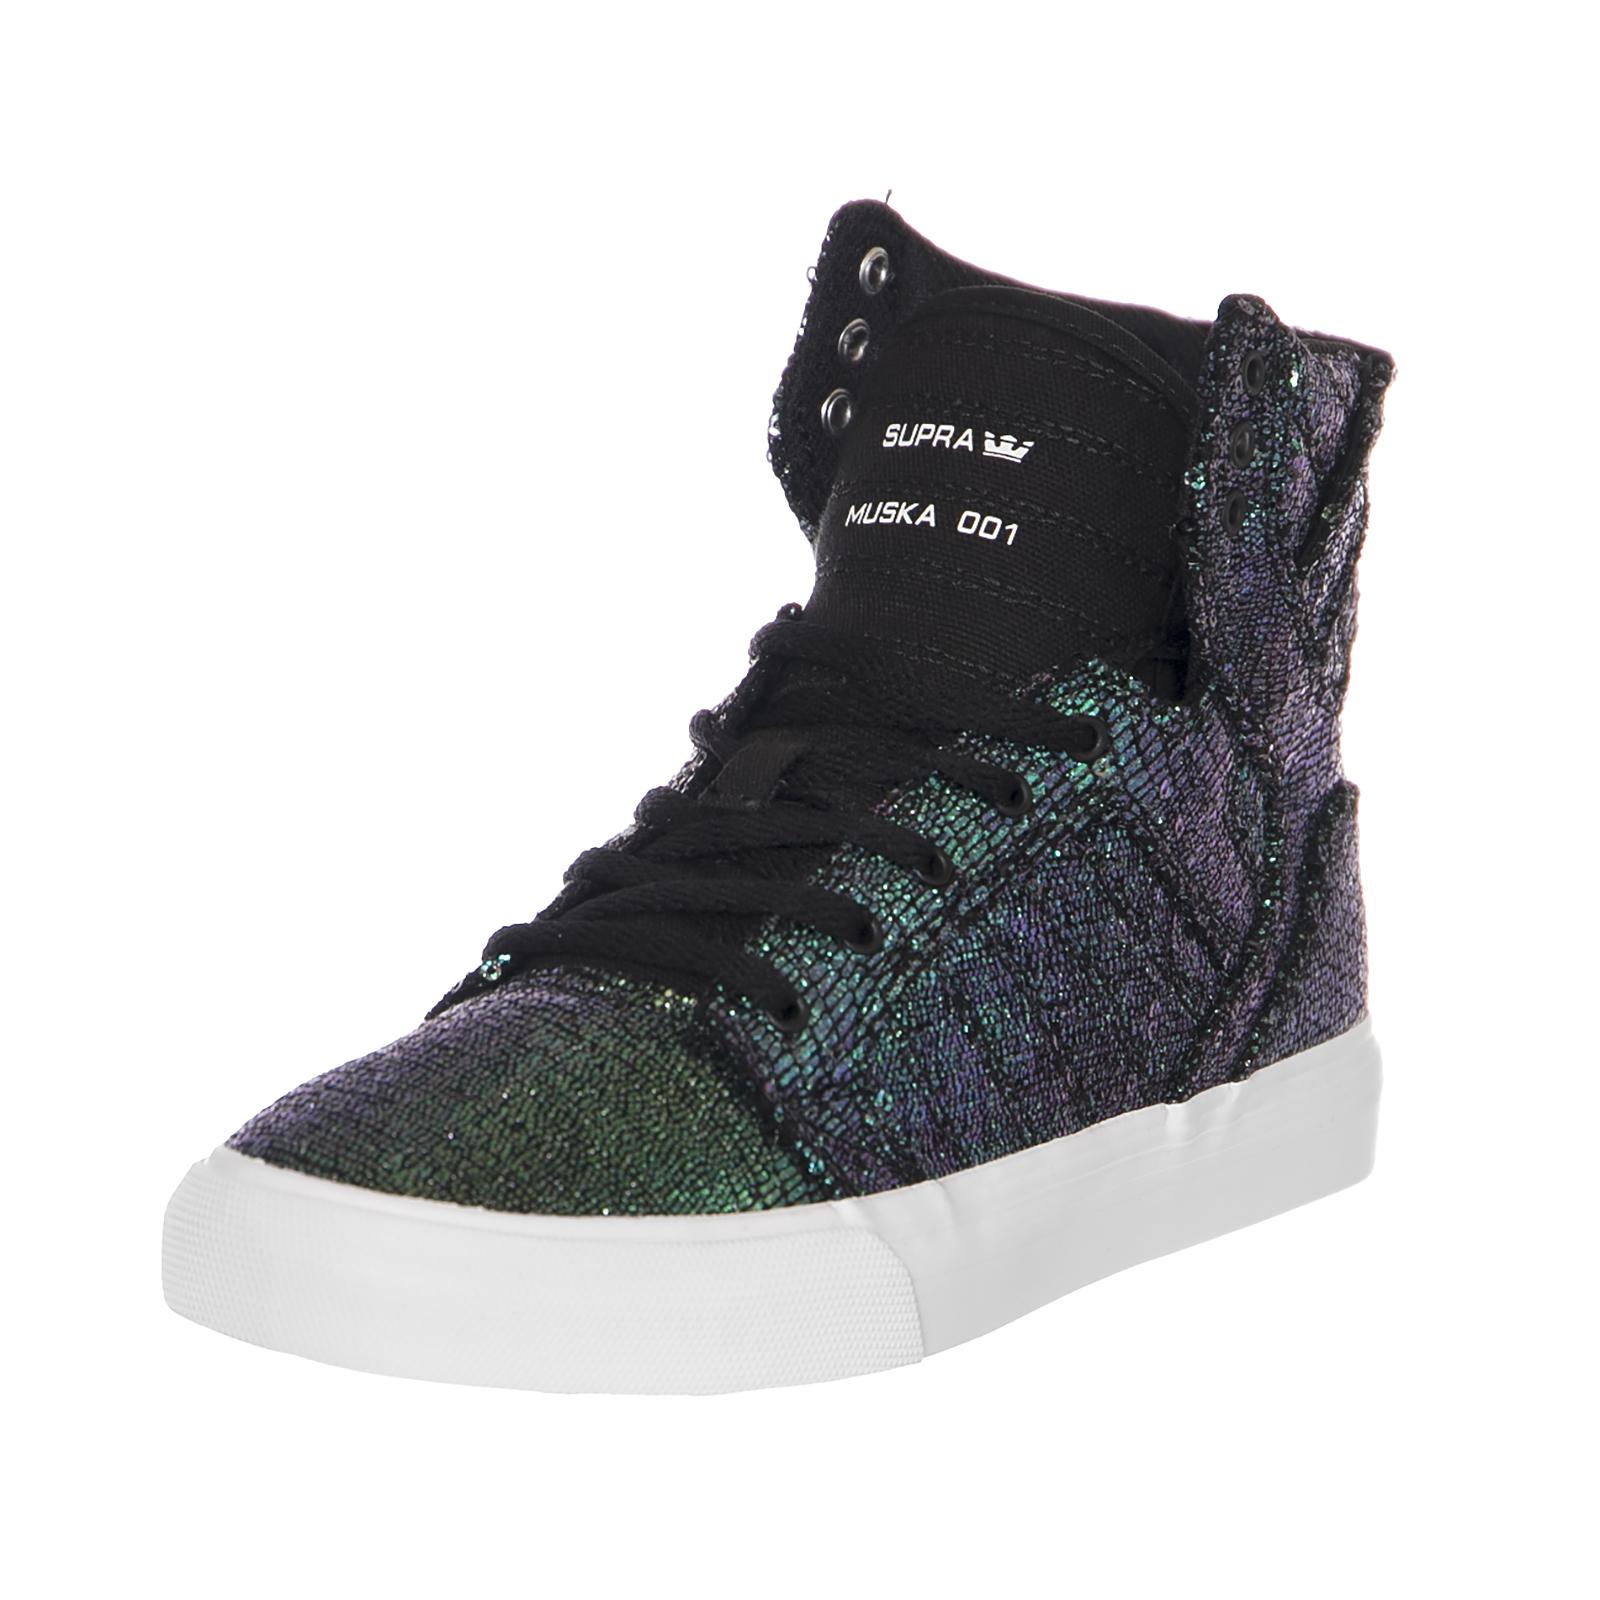 Black Sneakers Supra Sequin Skytop Cornerstone Kids NeroEbay dCtrxhsQ